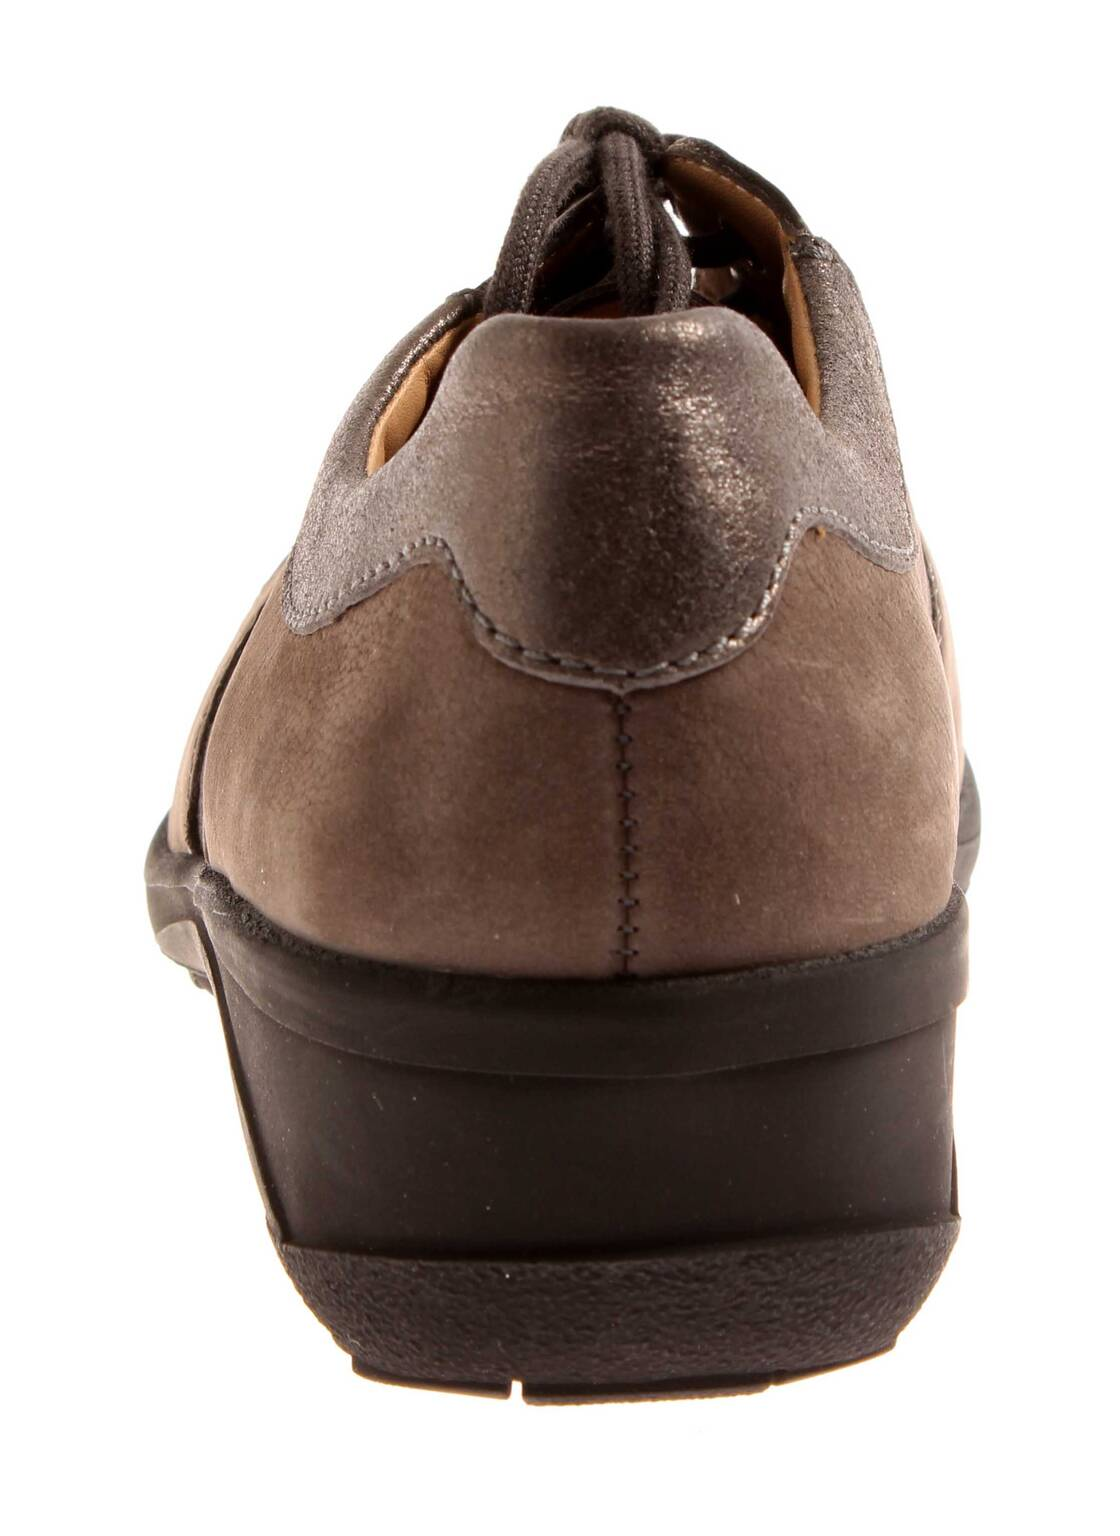 Solidus Comfort Halbschuhe Damenschuhe Leder Leder Leder Schuhe Karo 42045 aedb00